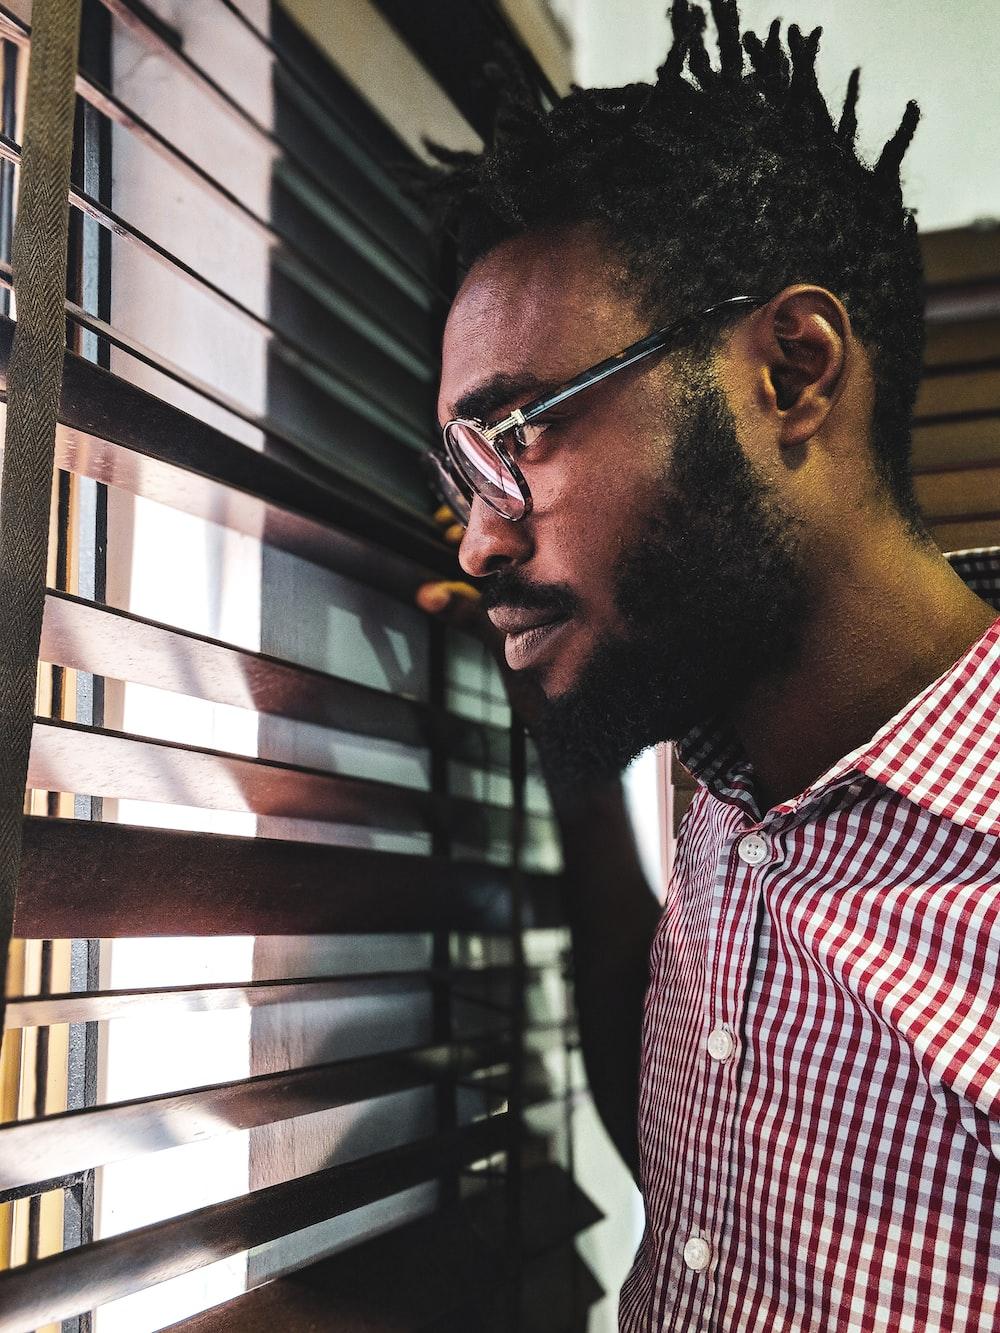 man looking through the window blind inside room